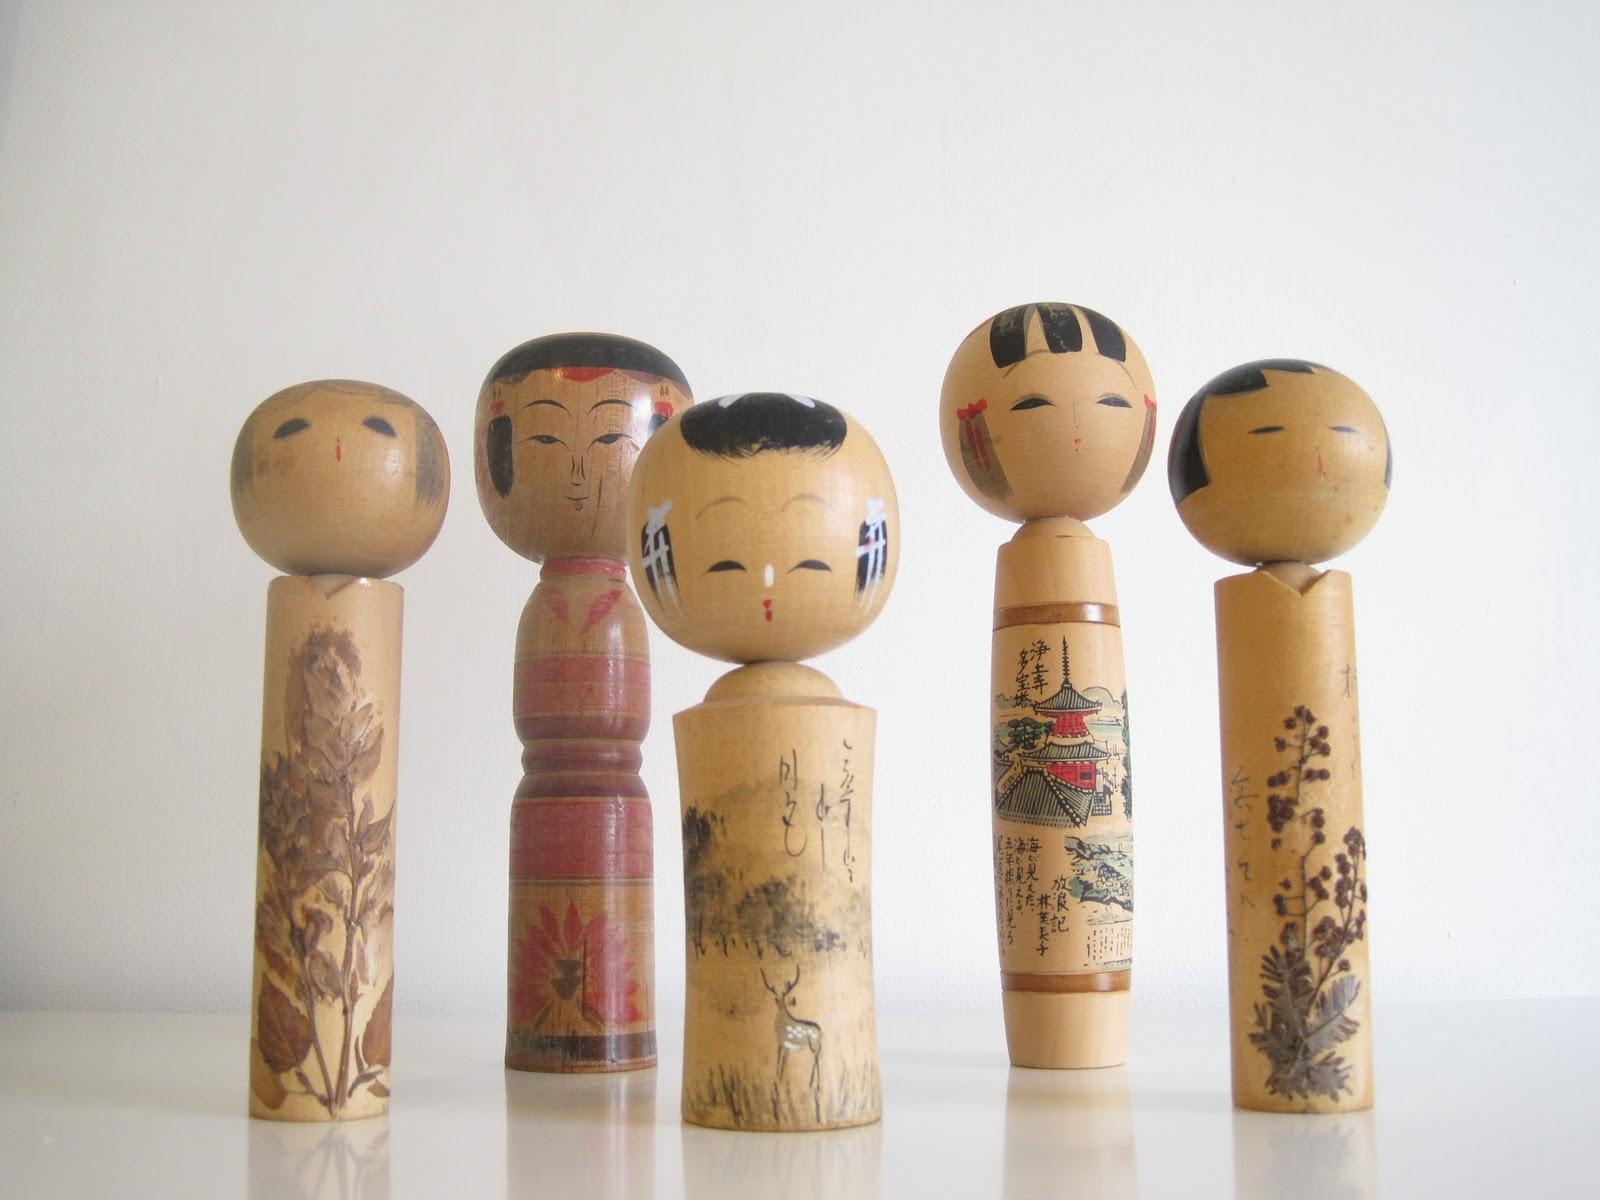 Scarlet pyjamas kokeshi dolls for Japan craft